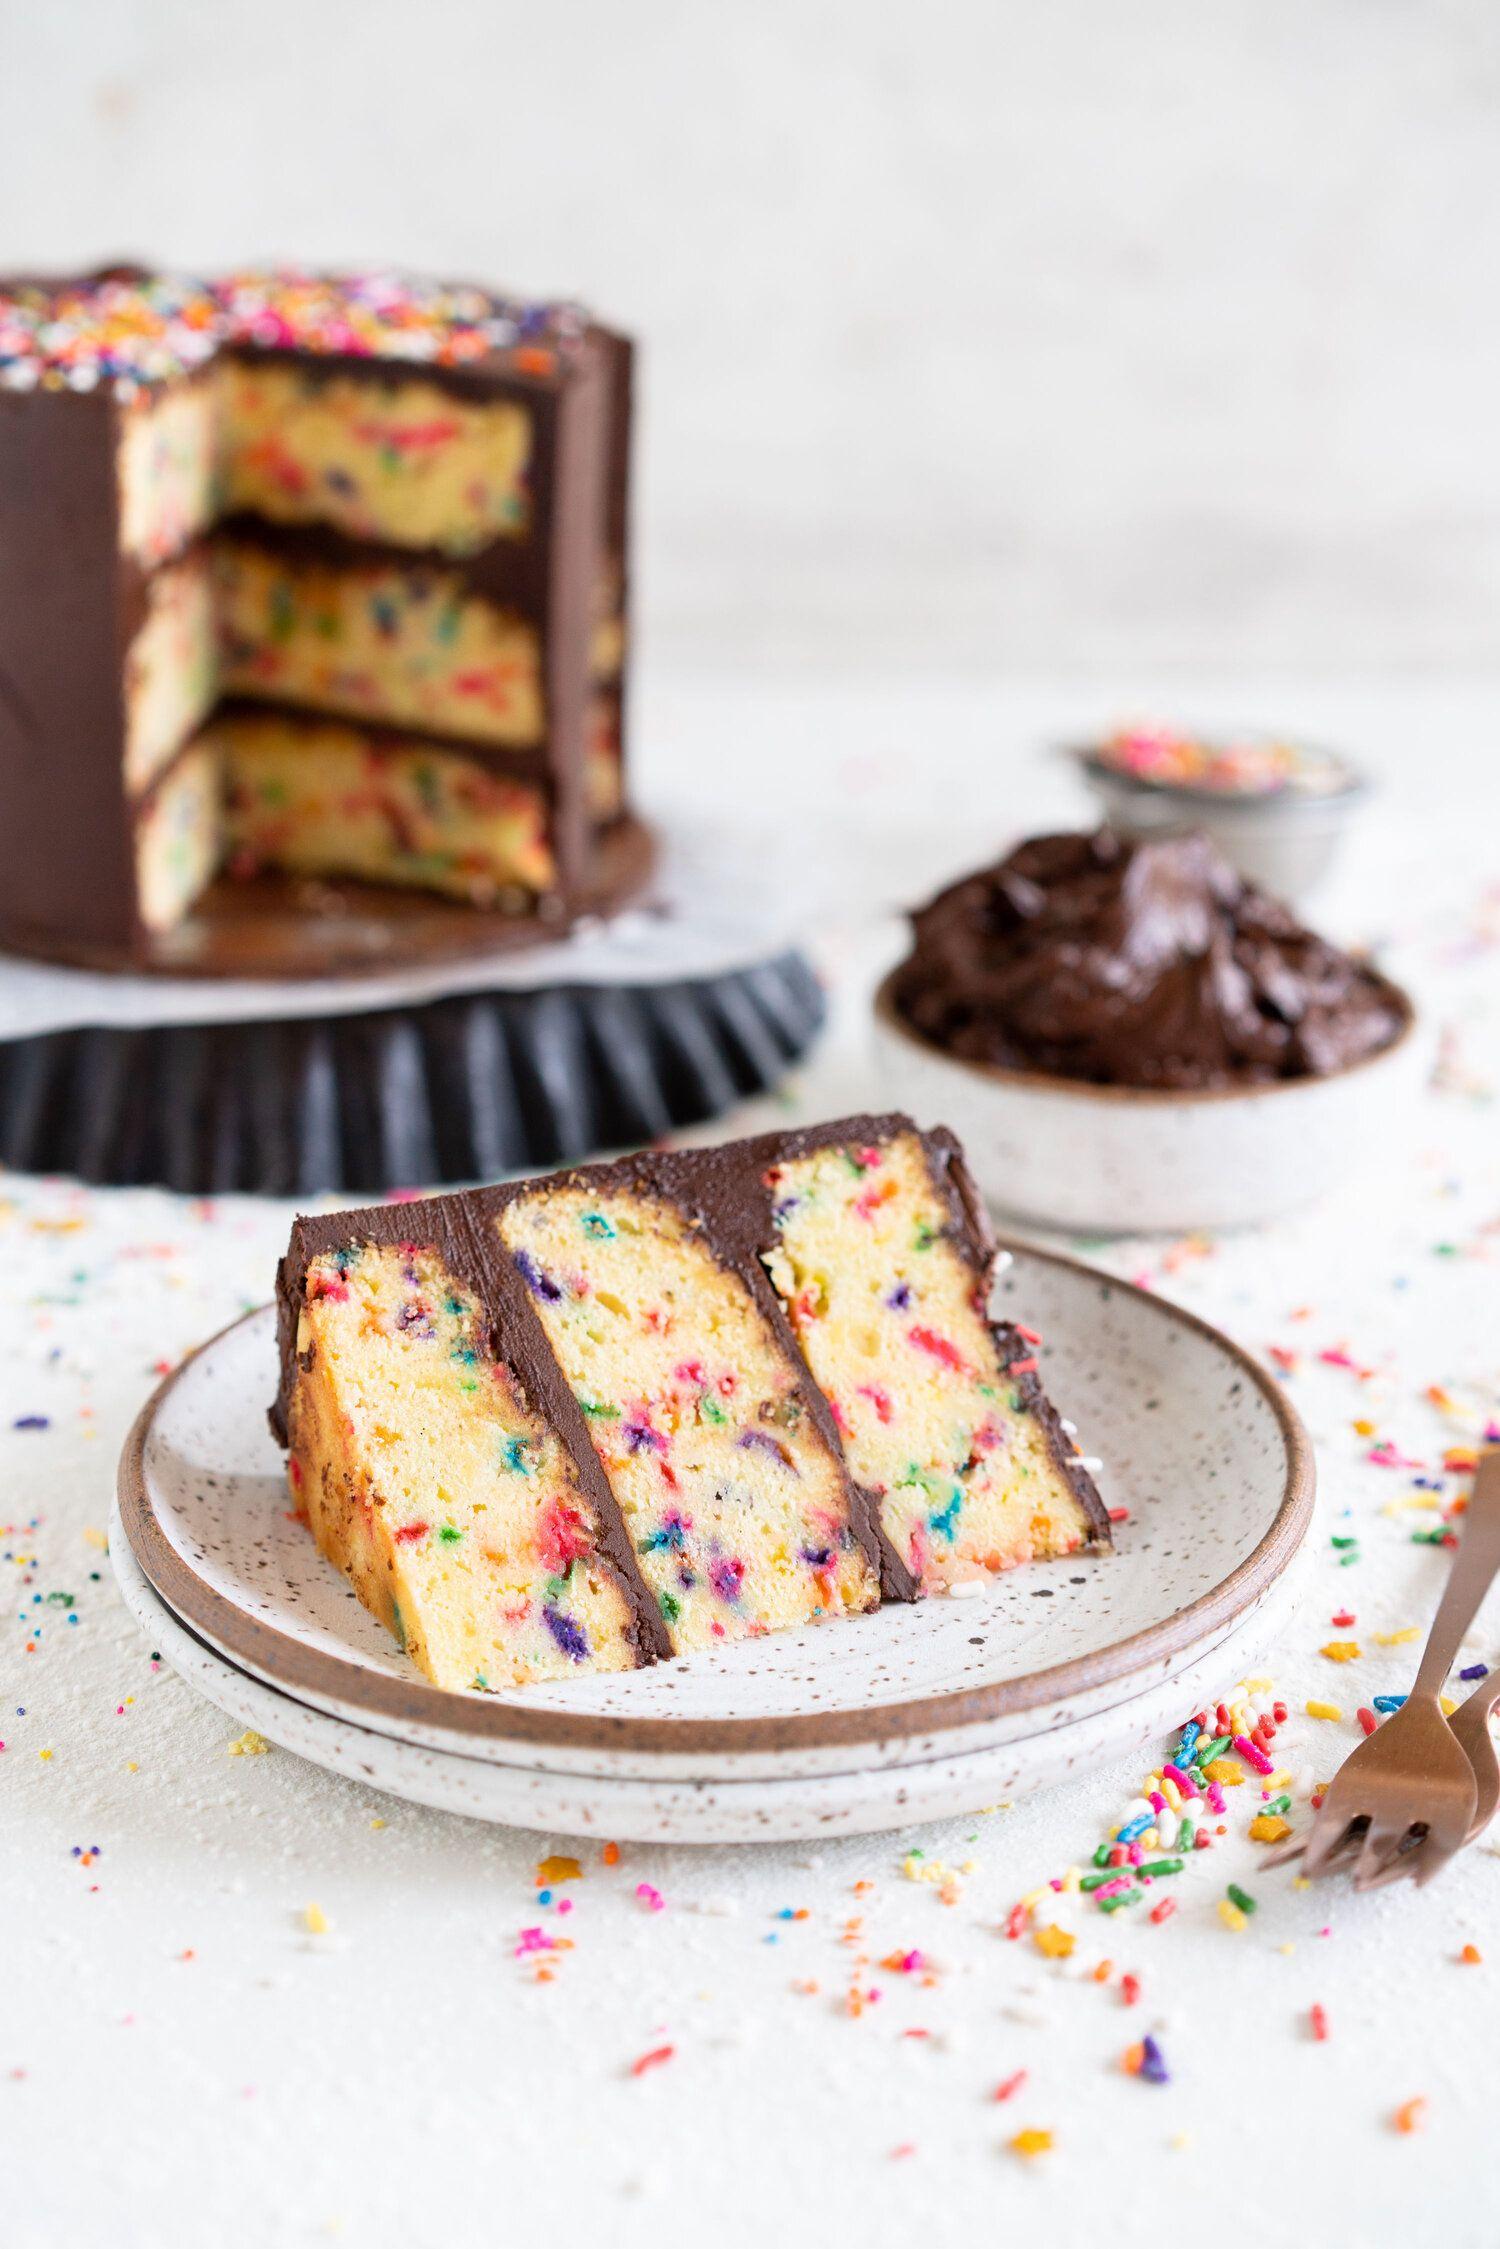 Funfetti cake with dark chocolate buttercream cloudy